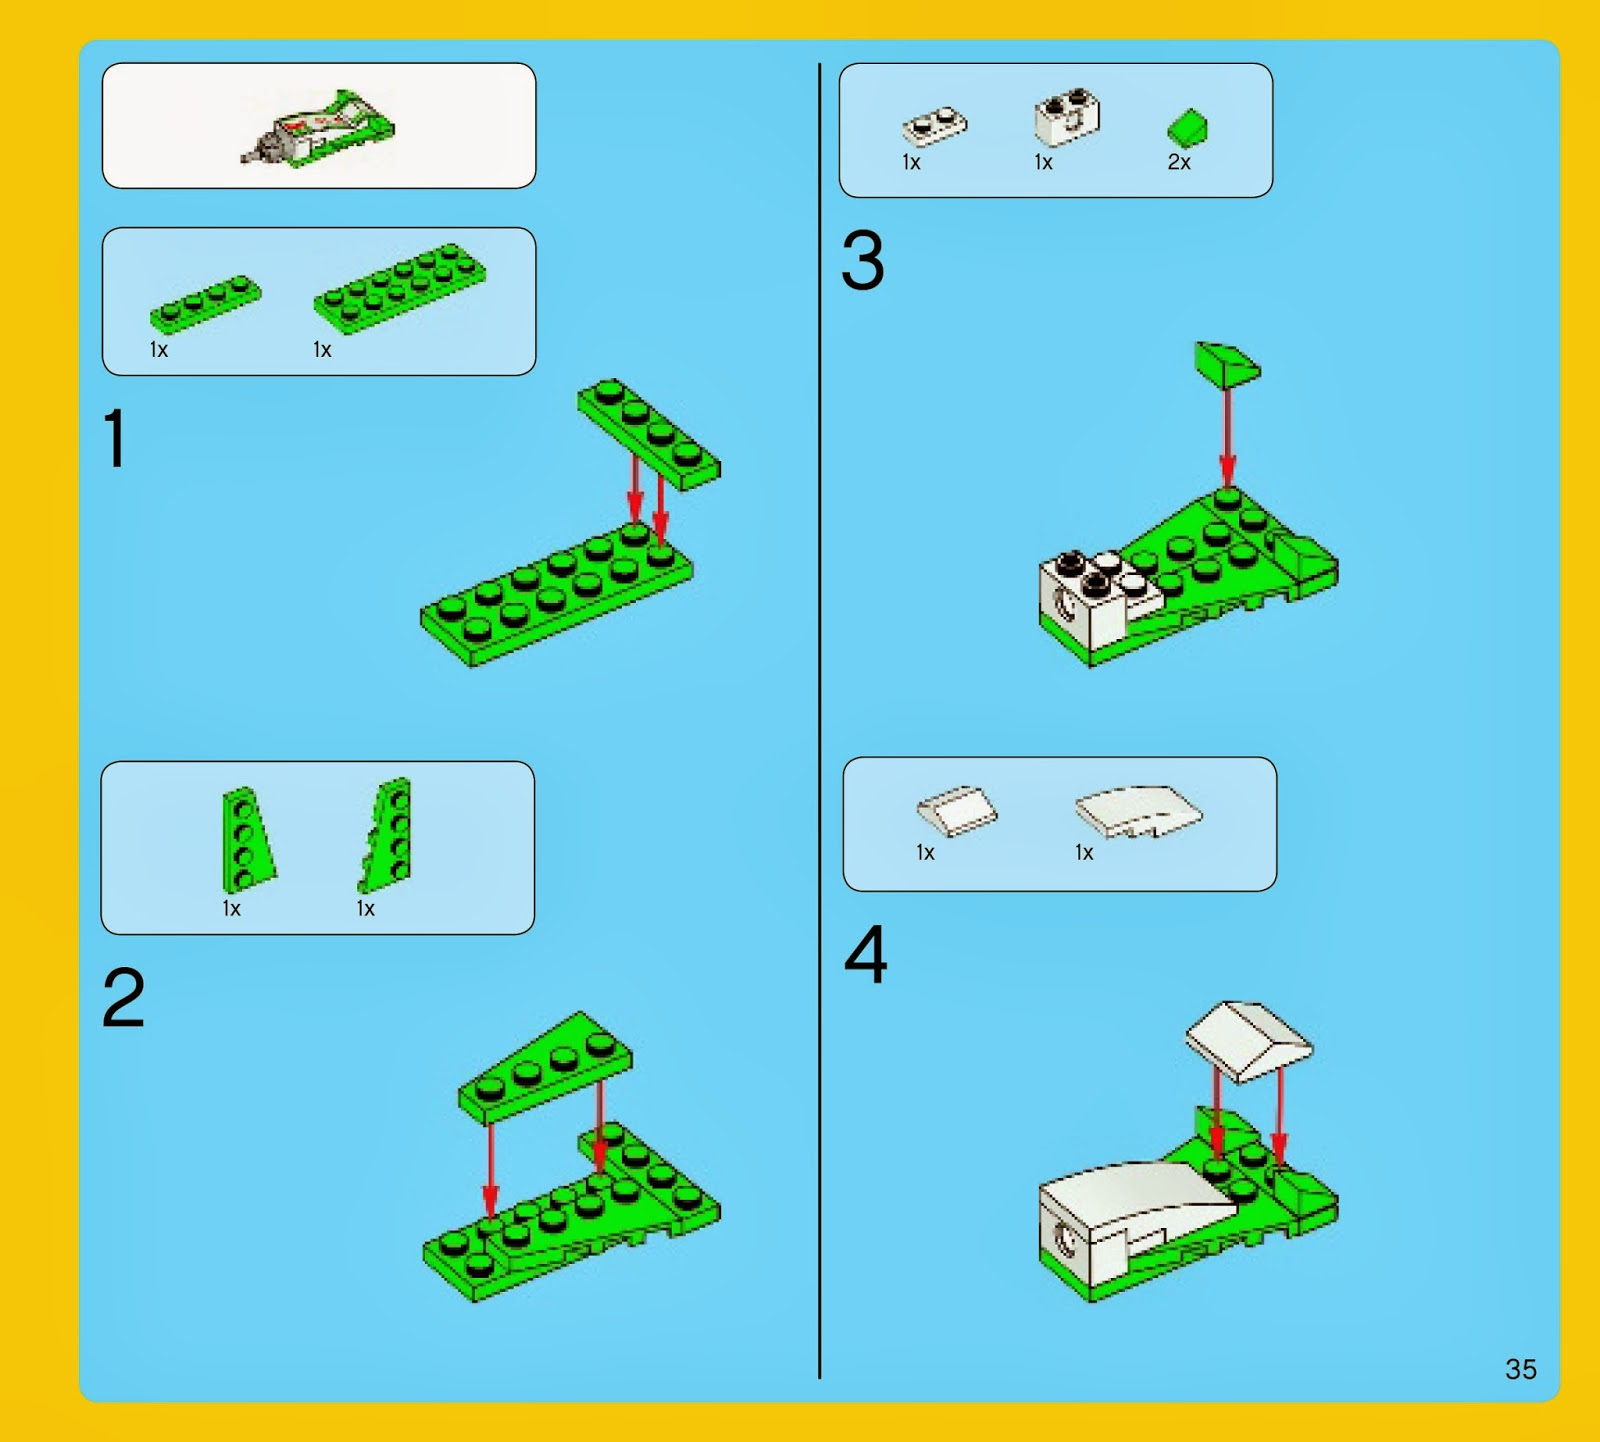 Techfleet Spot Lego Movie Kragle Build Instructions